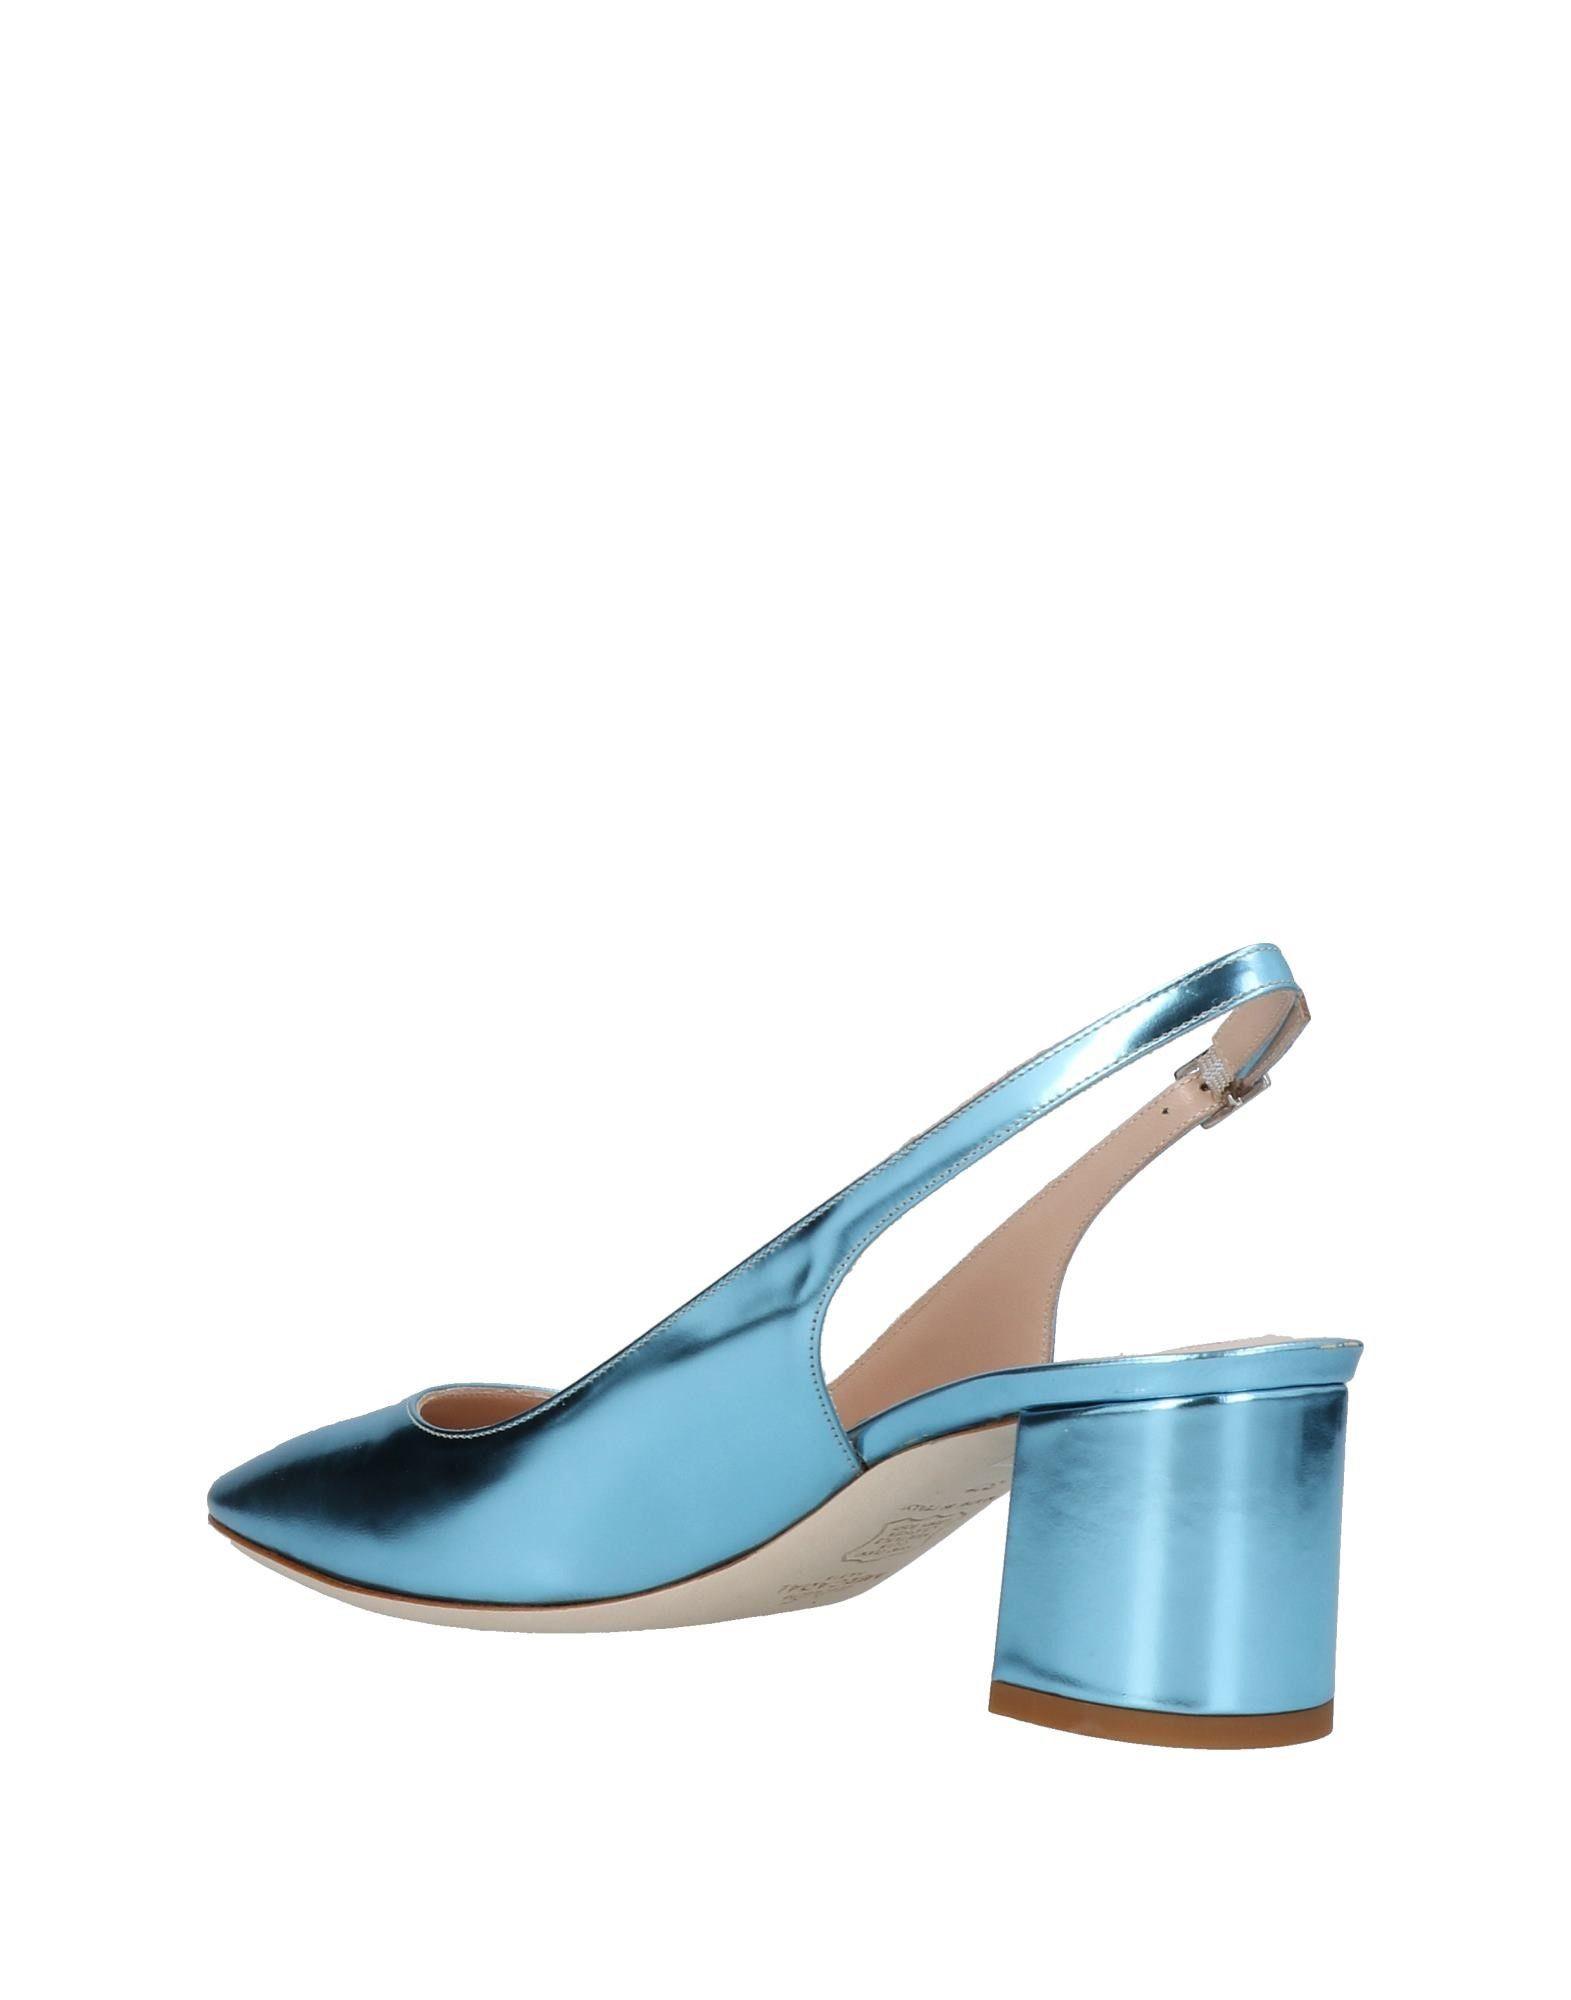 Atelier Mercadal 11499323LQGut Pumps Damen  11499323LQGut Mercadal aussehende strapazierfähige Schuhe 1f3e5c